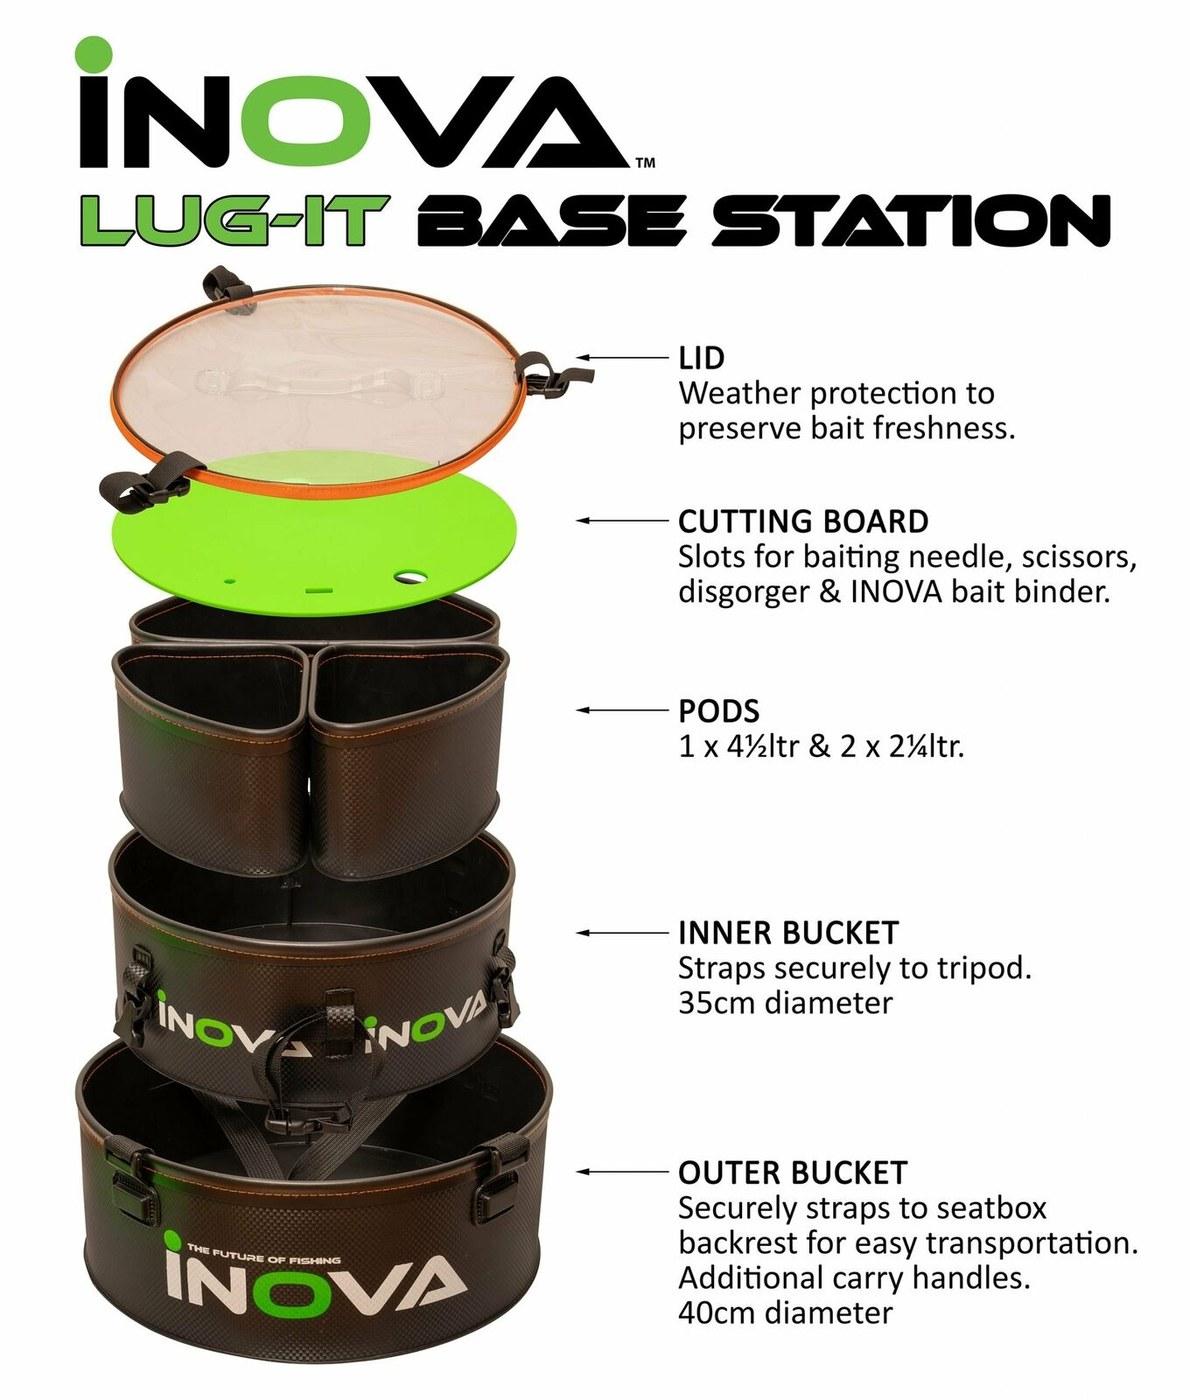 Inova LUG-It Base Station